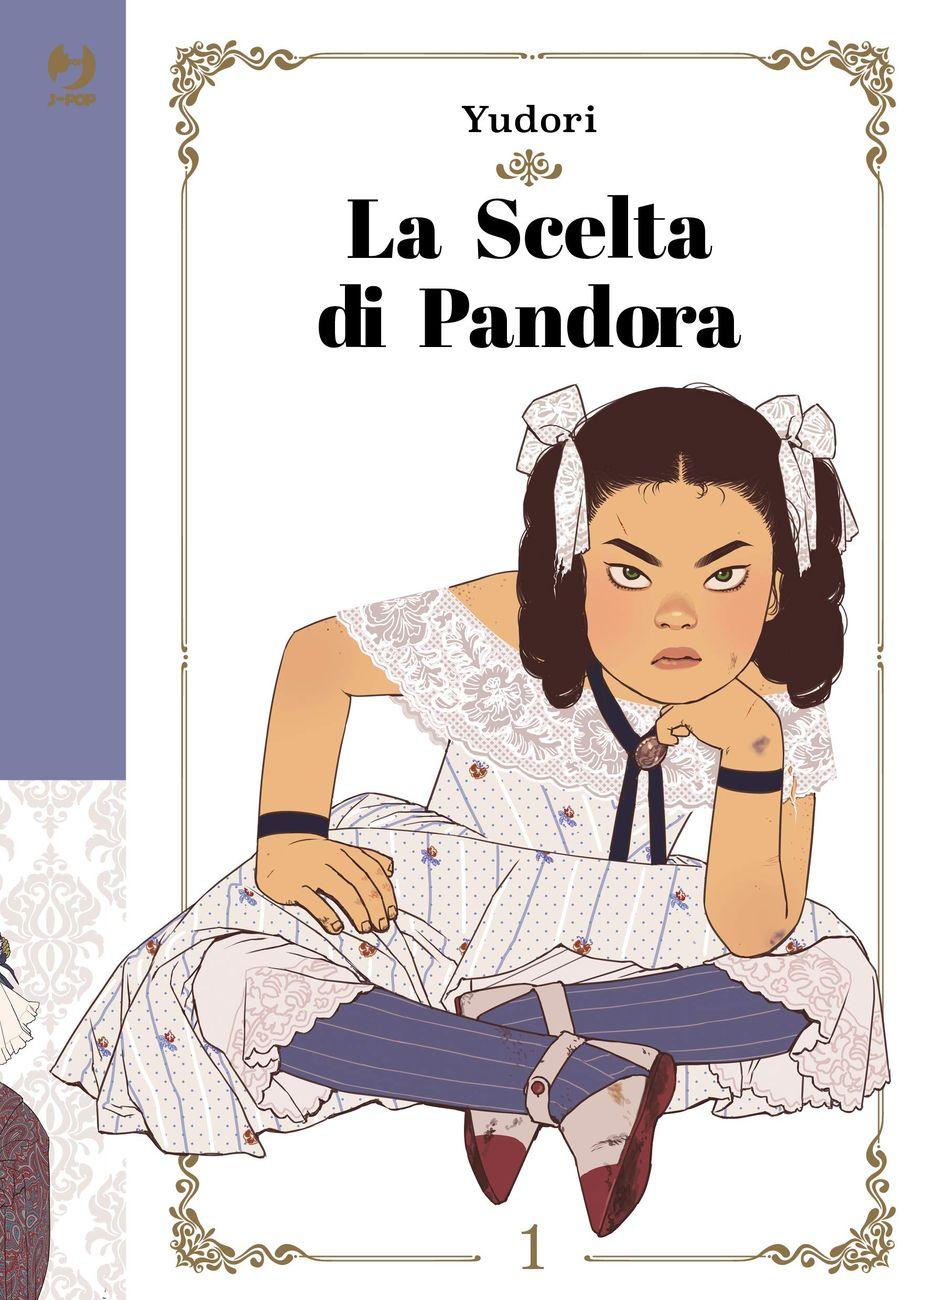 Yudori – La Scelta di Pandora #1 (J POP Manga, Milano 2019) _cover